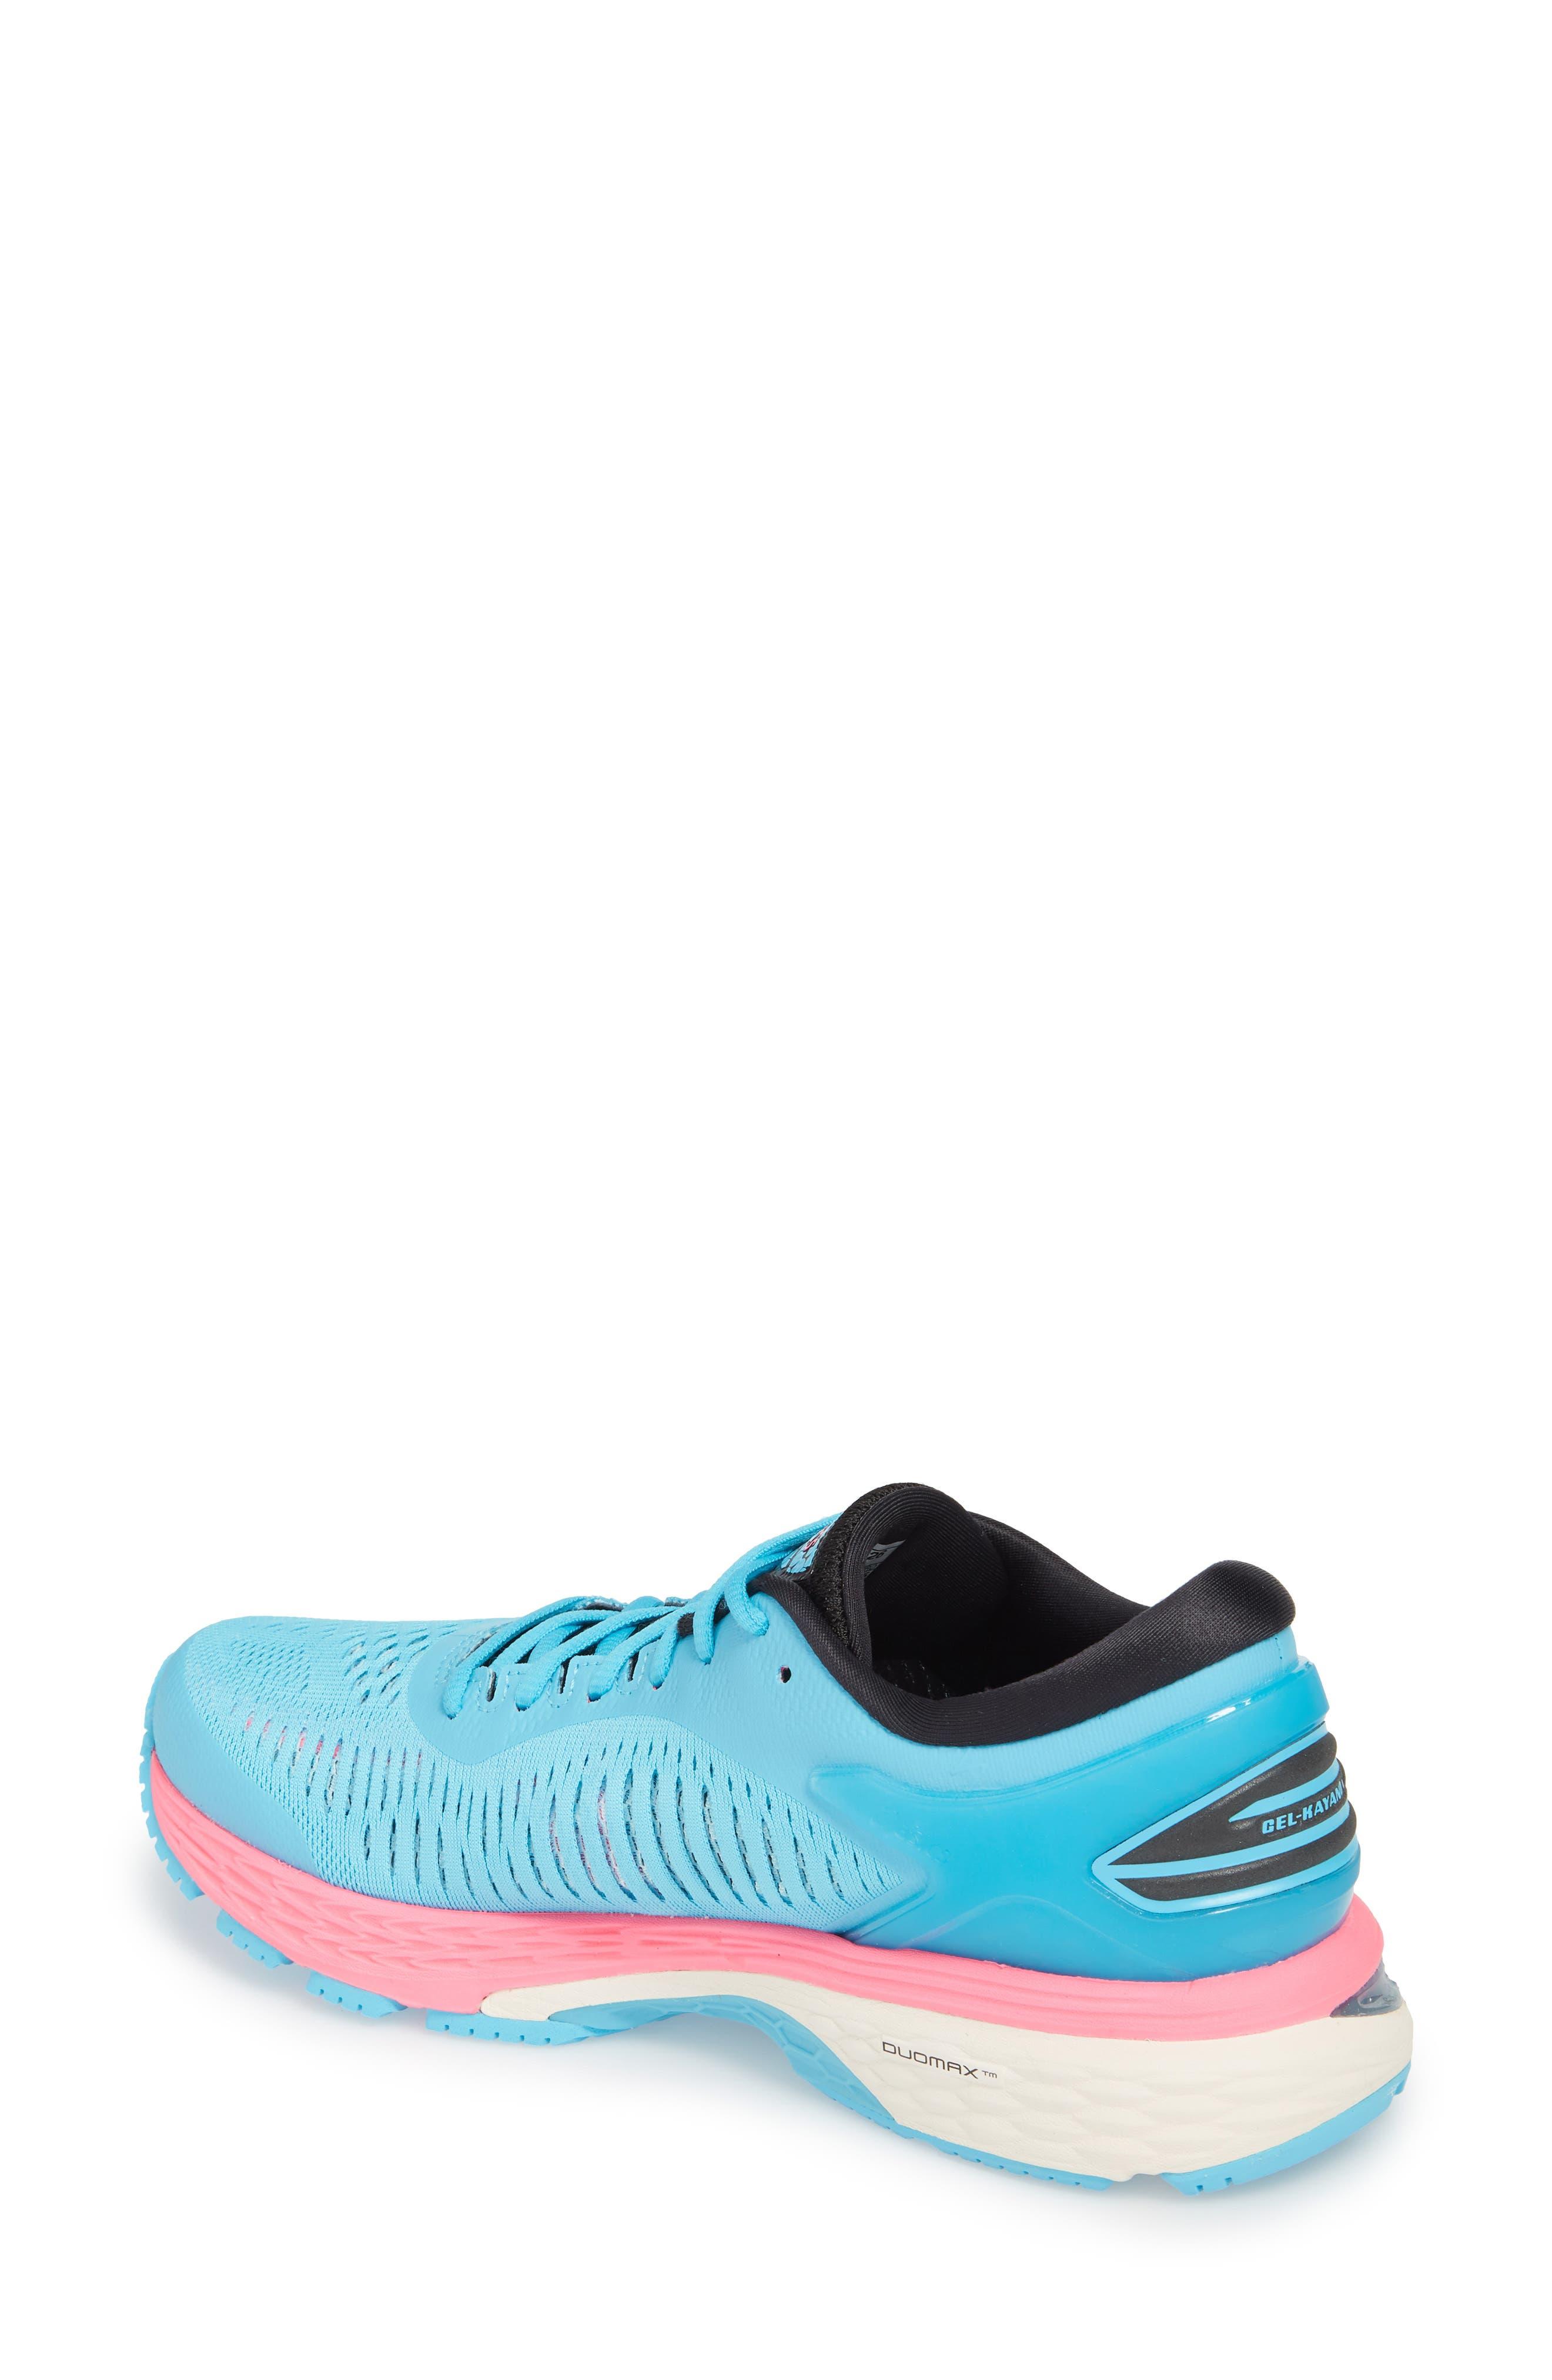 GEL-Kayano<sup>®</sup> 25 Running Shoe,                             Alternate thumbnail 2, color,                             AQUARIUM/ BLACK